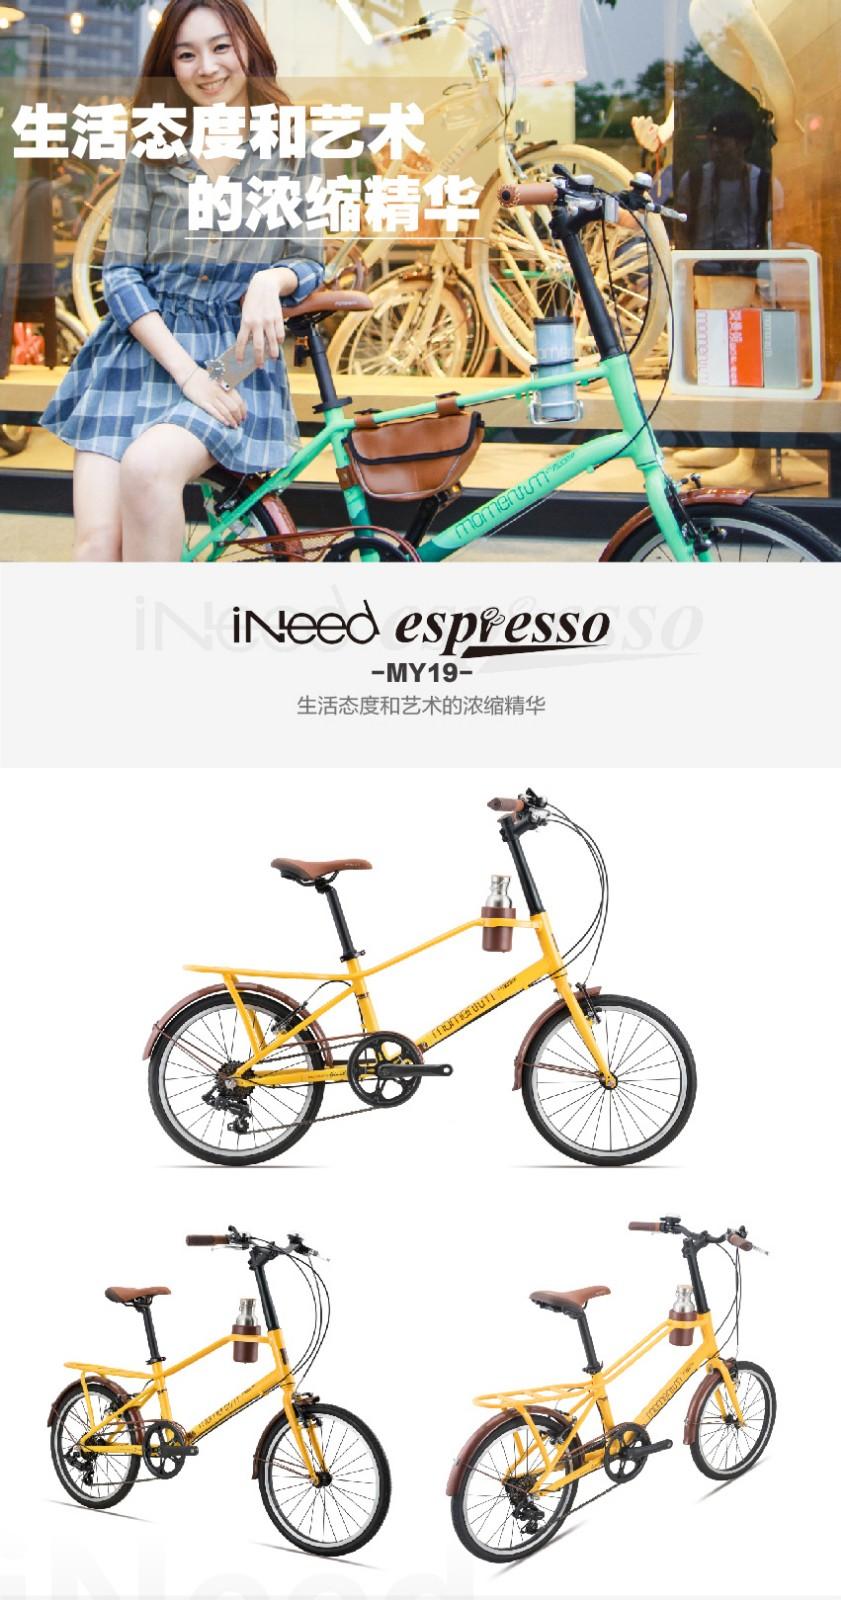 2019-espresso上市通报-(15)_01.jpg